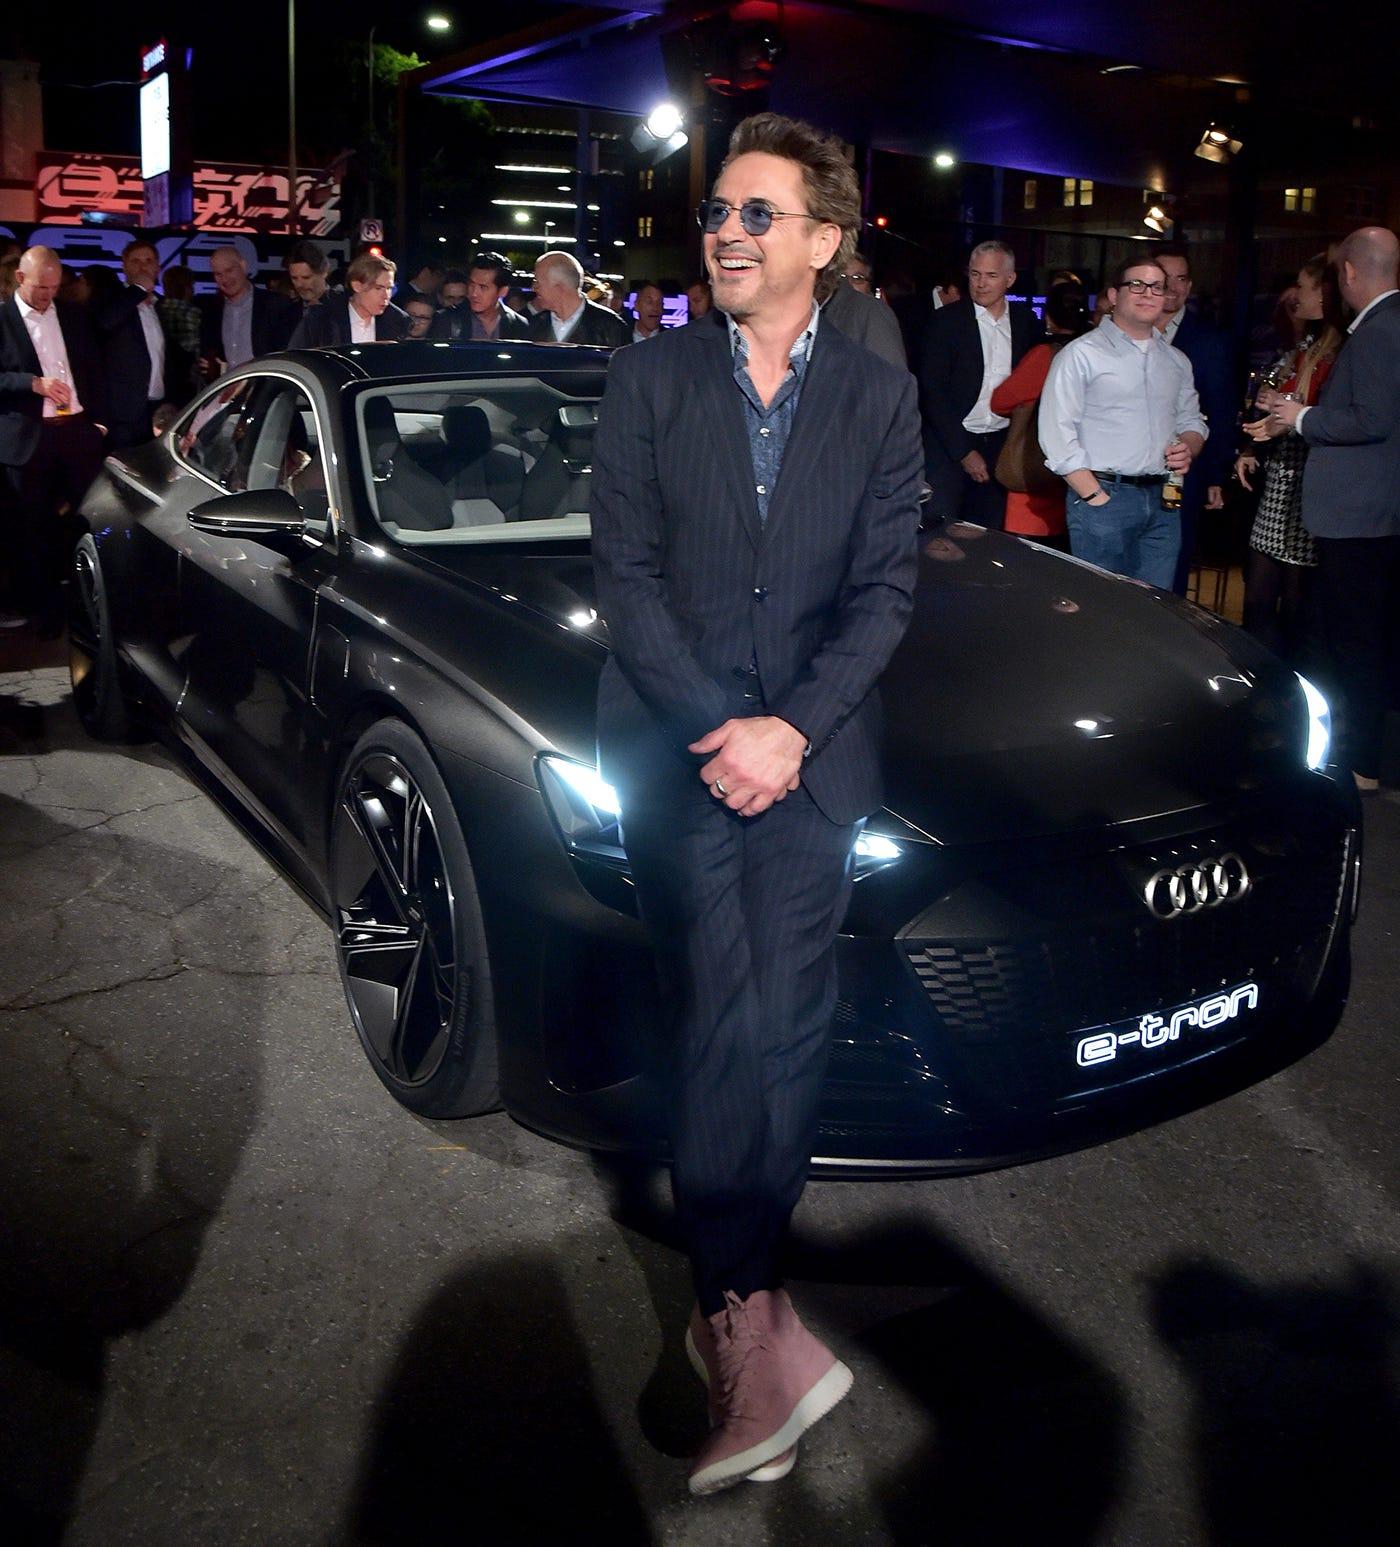 Stefanie Keenan / Getty Images for Audi of America